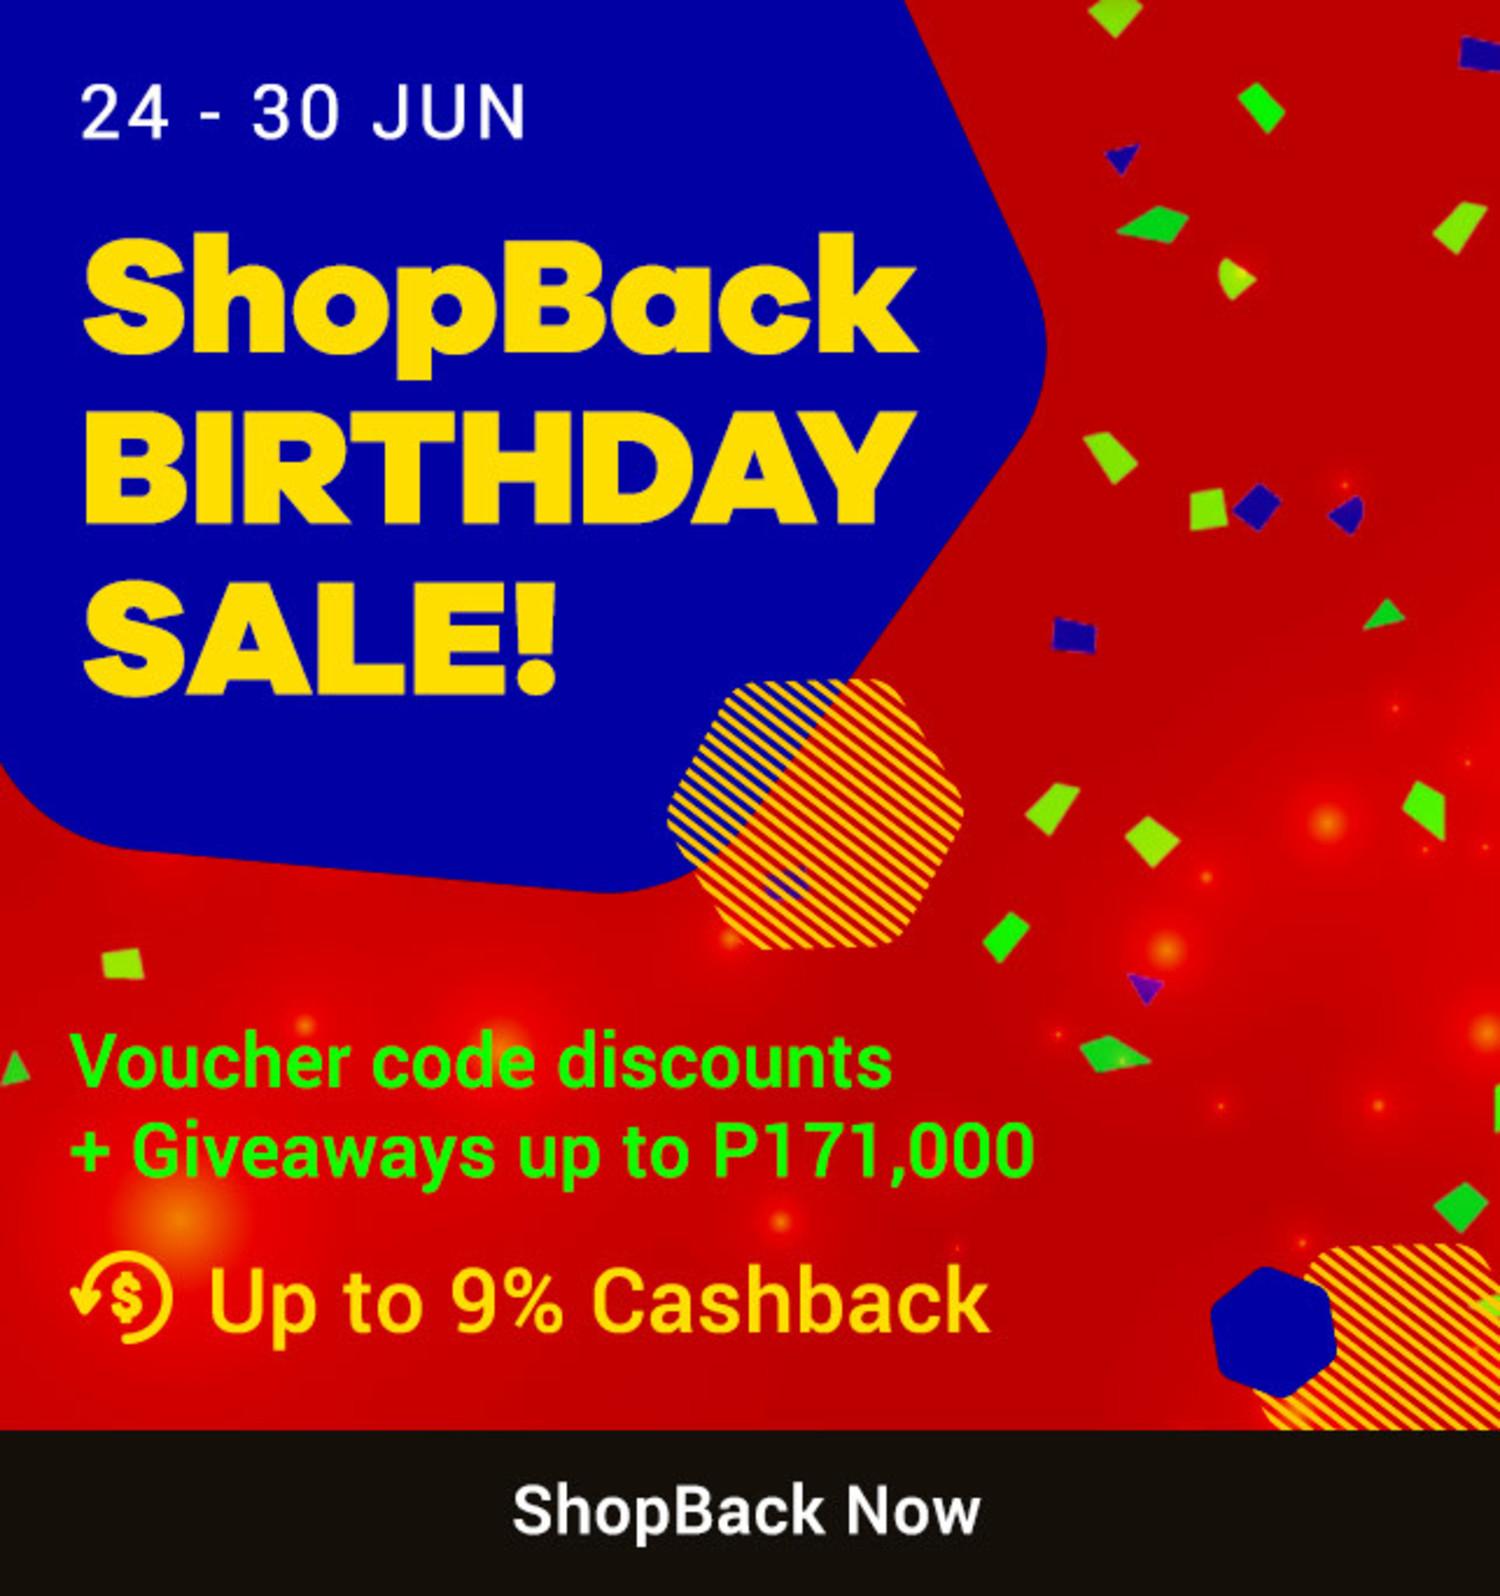 ShopBack Birthday Sale: Day 1 | Up to 30% Mega Cashback